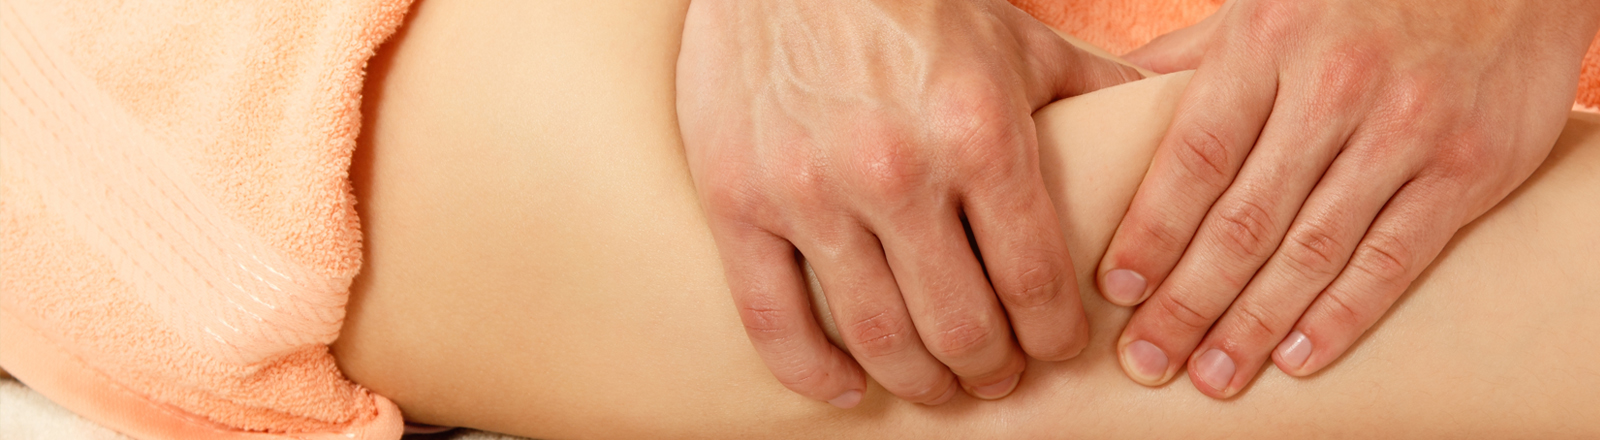 masaje descontracturante masaje